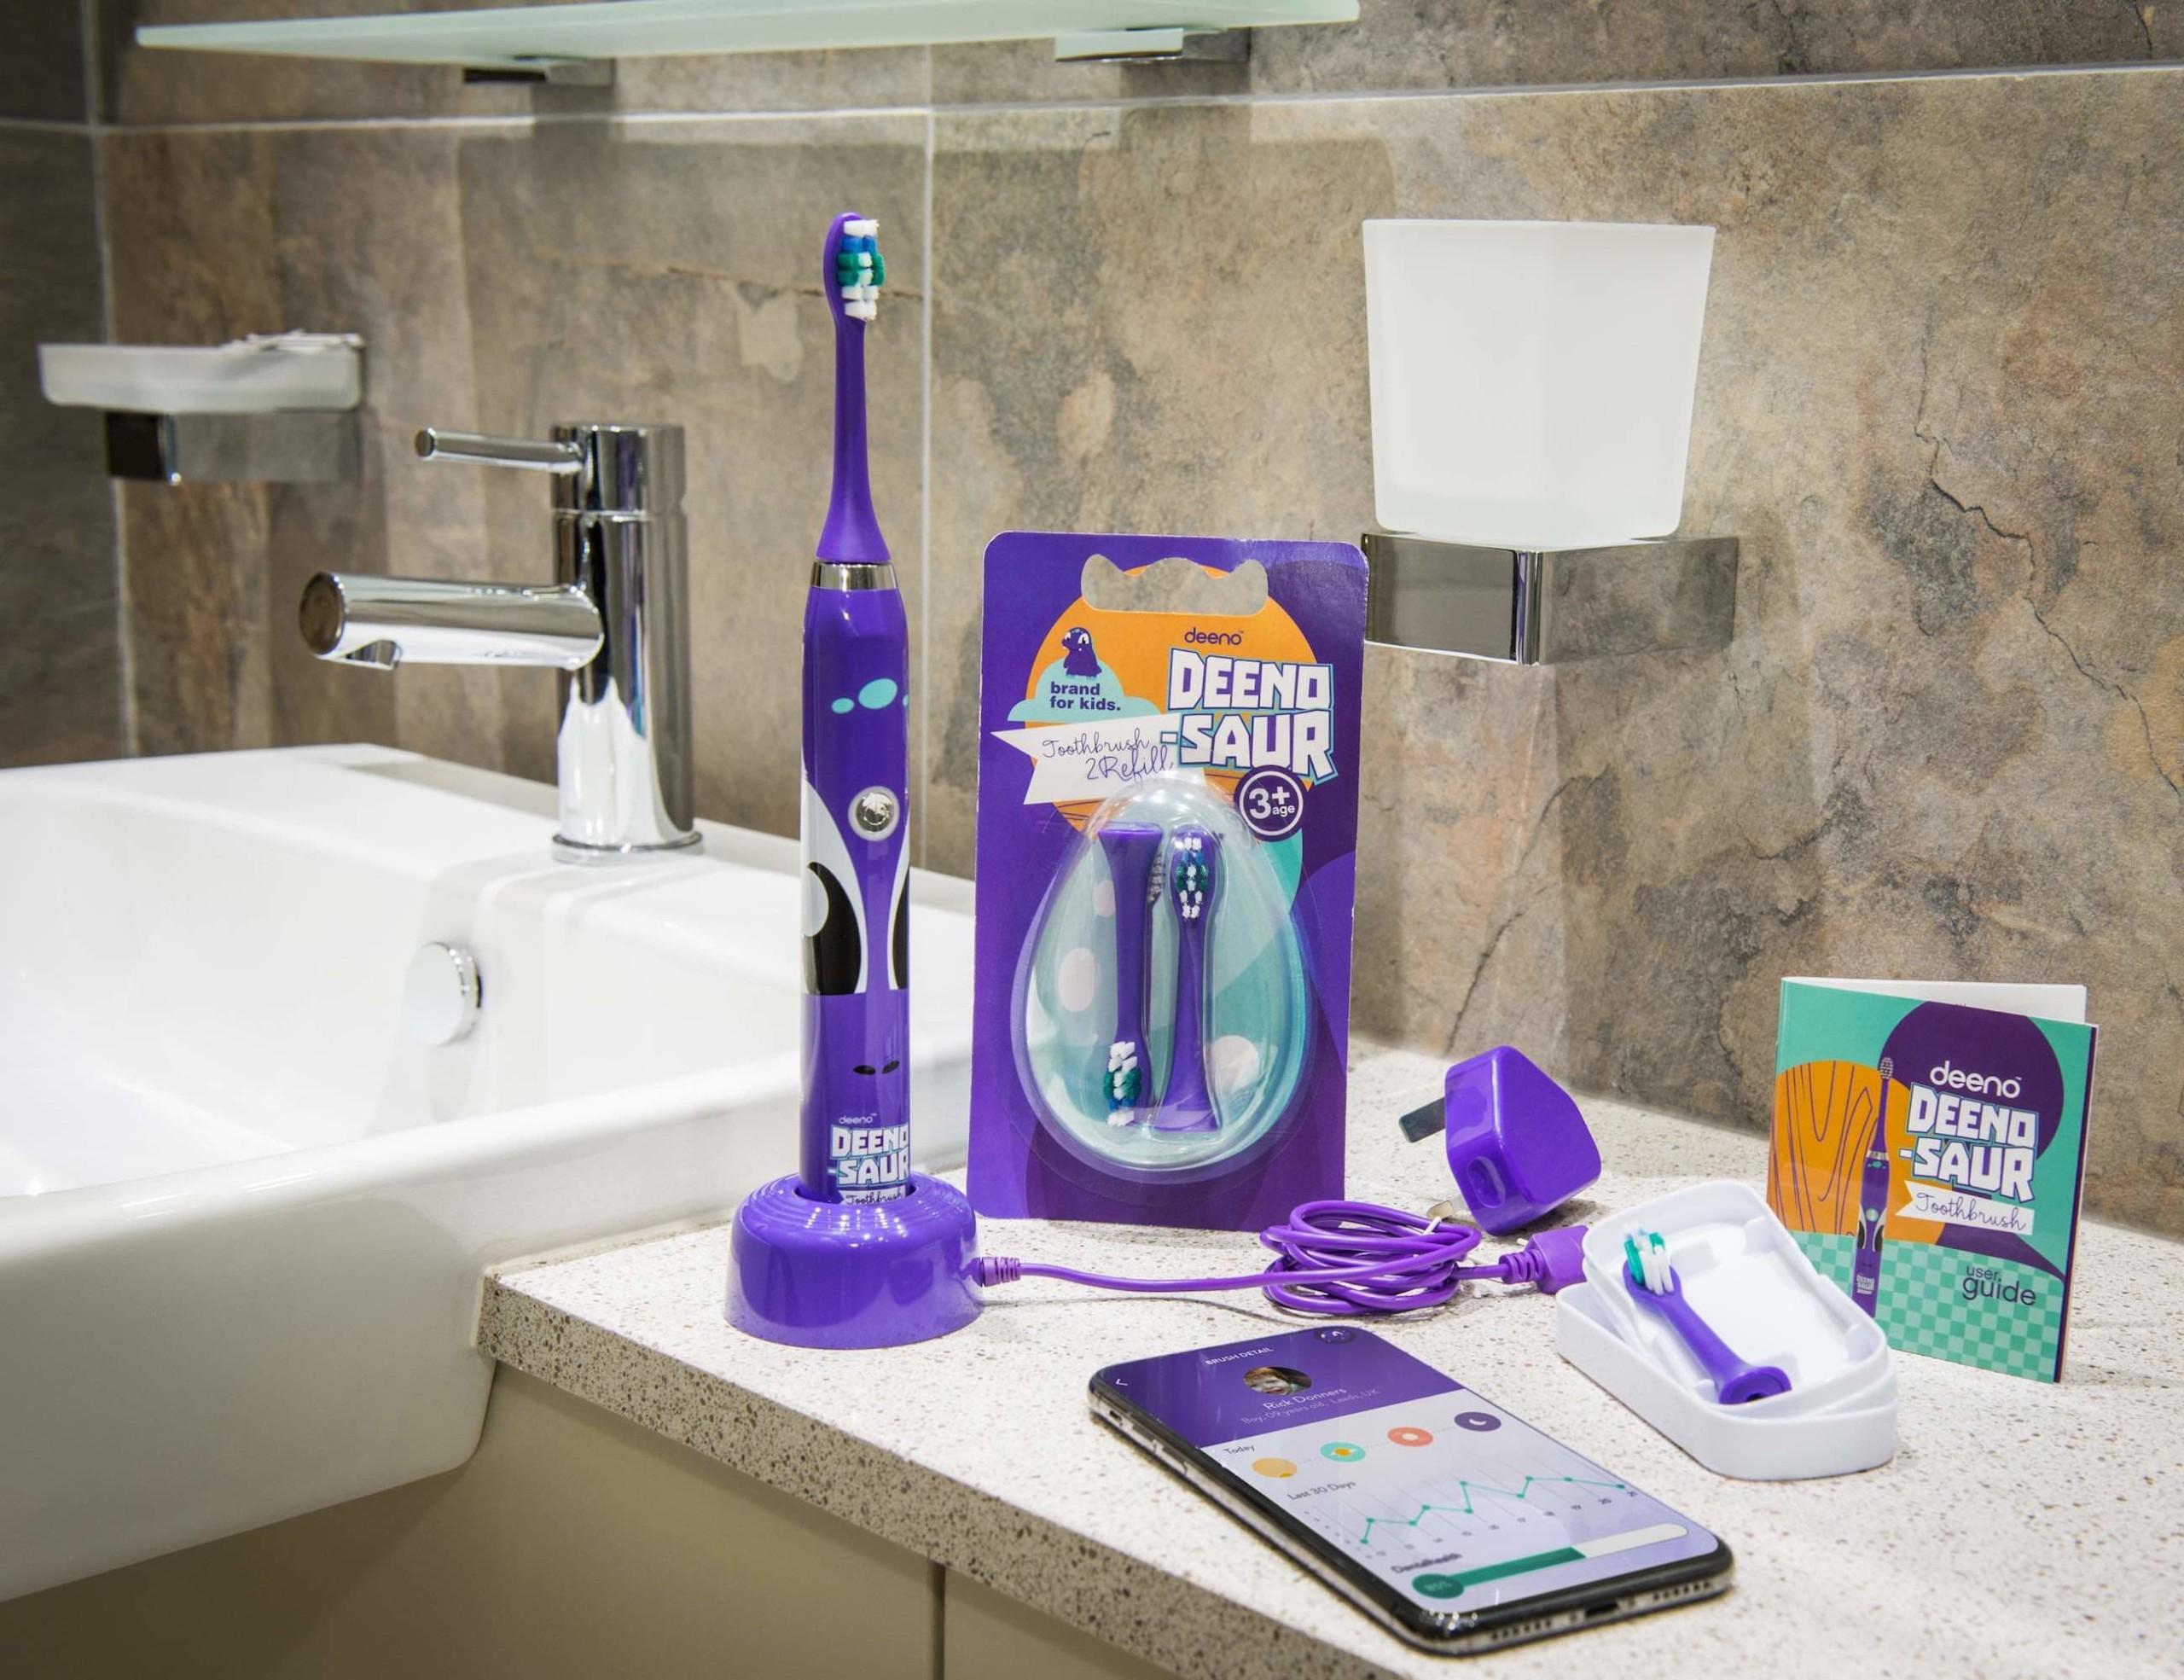 Deeno-saur Kids Smart Electric Toothbrush